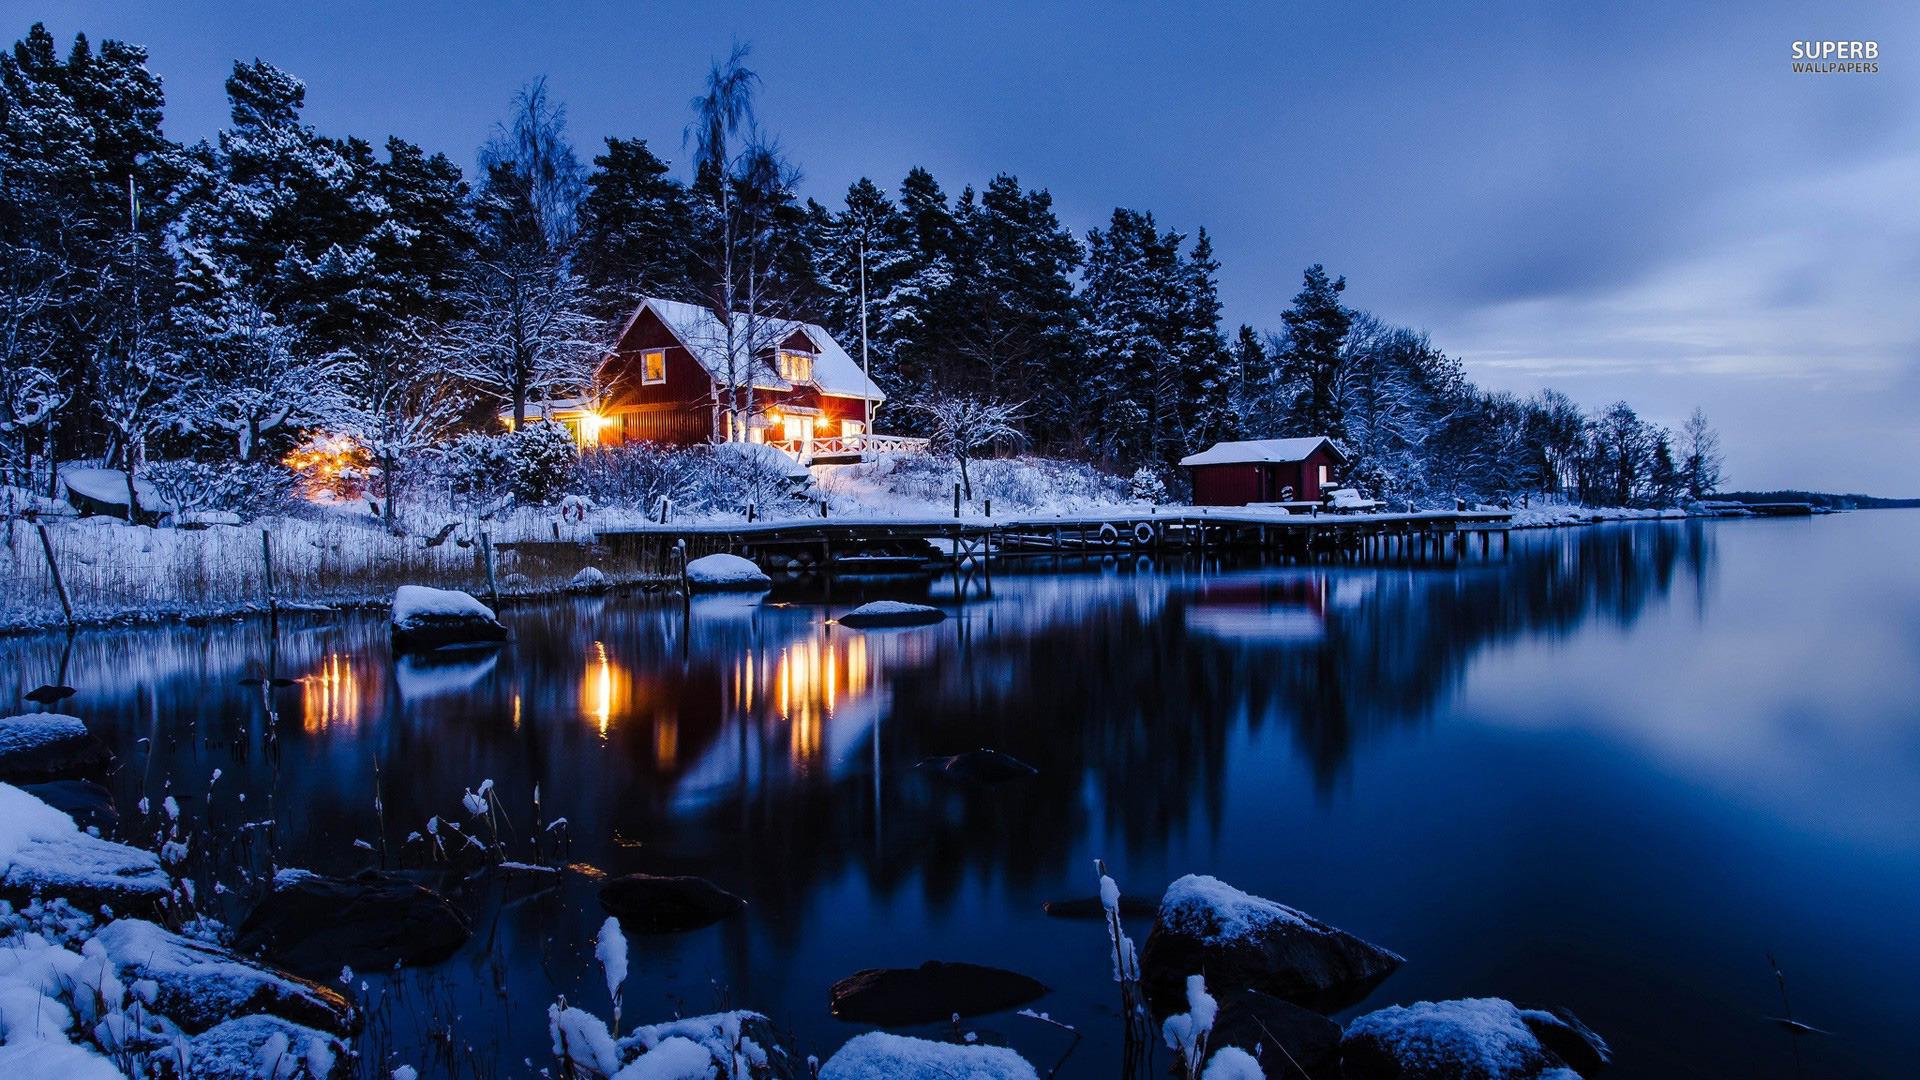 lakeside winter cabin 25436 1920x1080 1920x1080